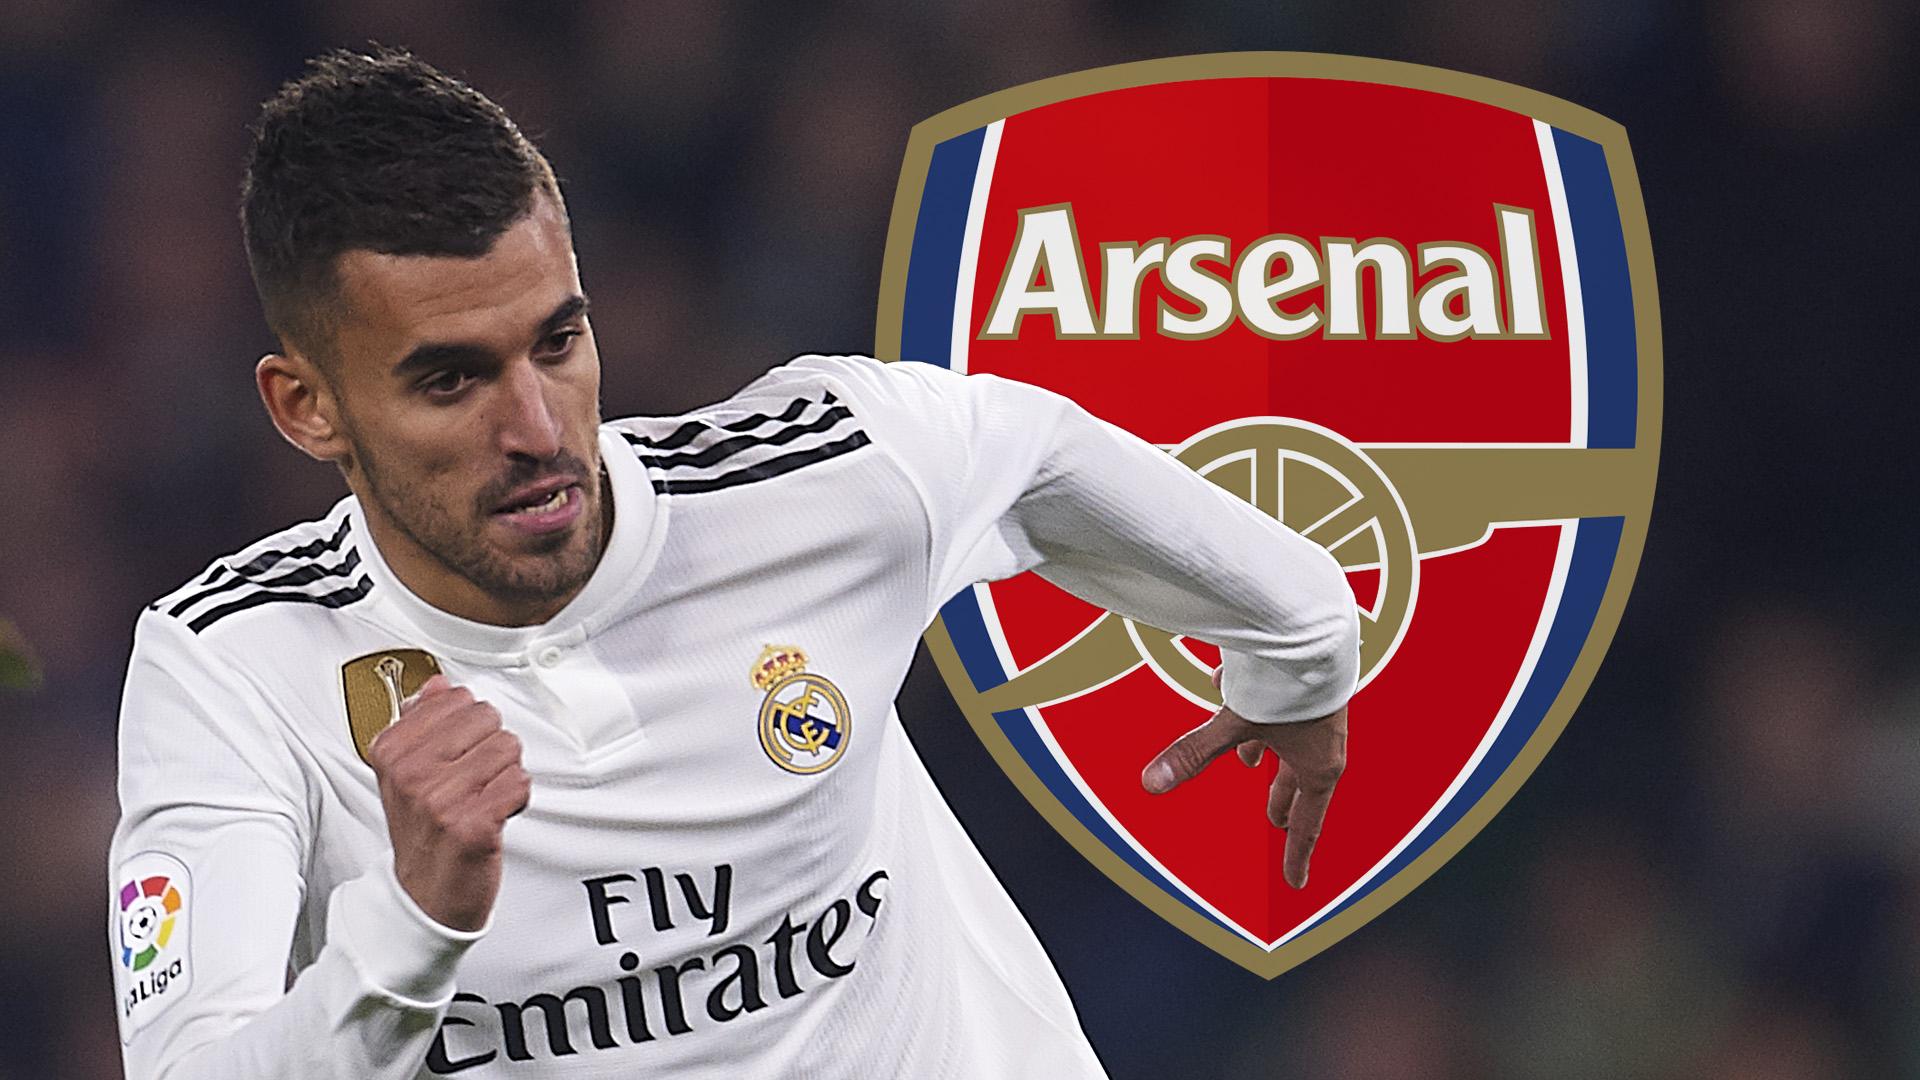 Arsenal officialise le prêt de Dani Ceballos (Real Madrid)